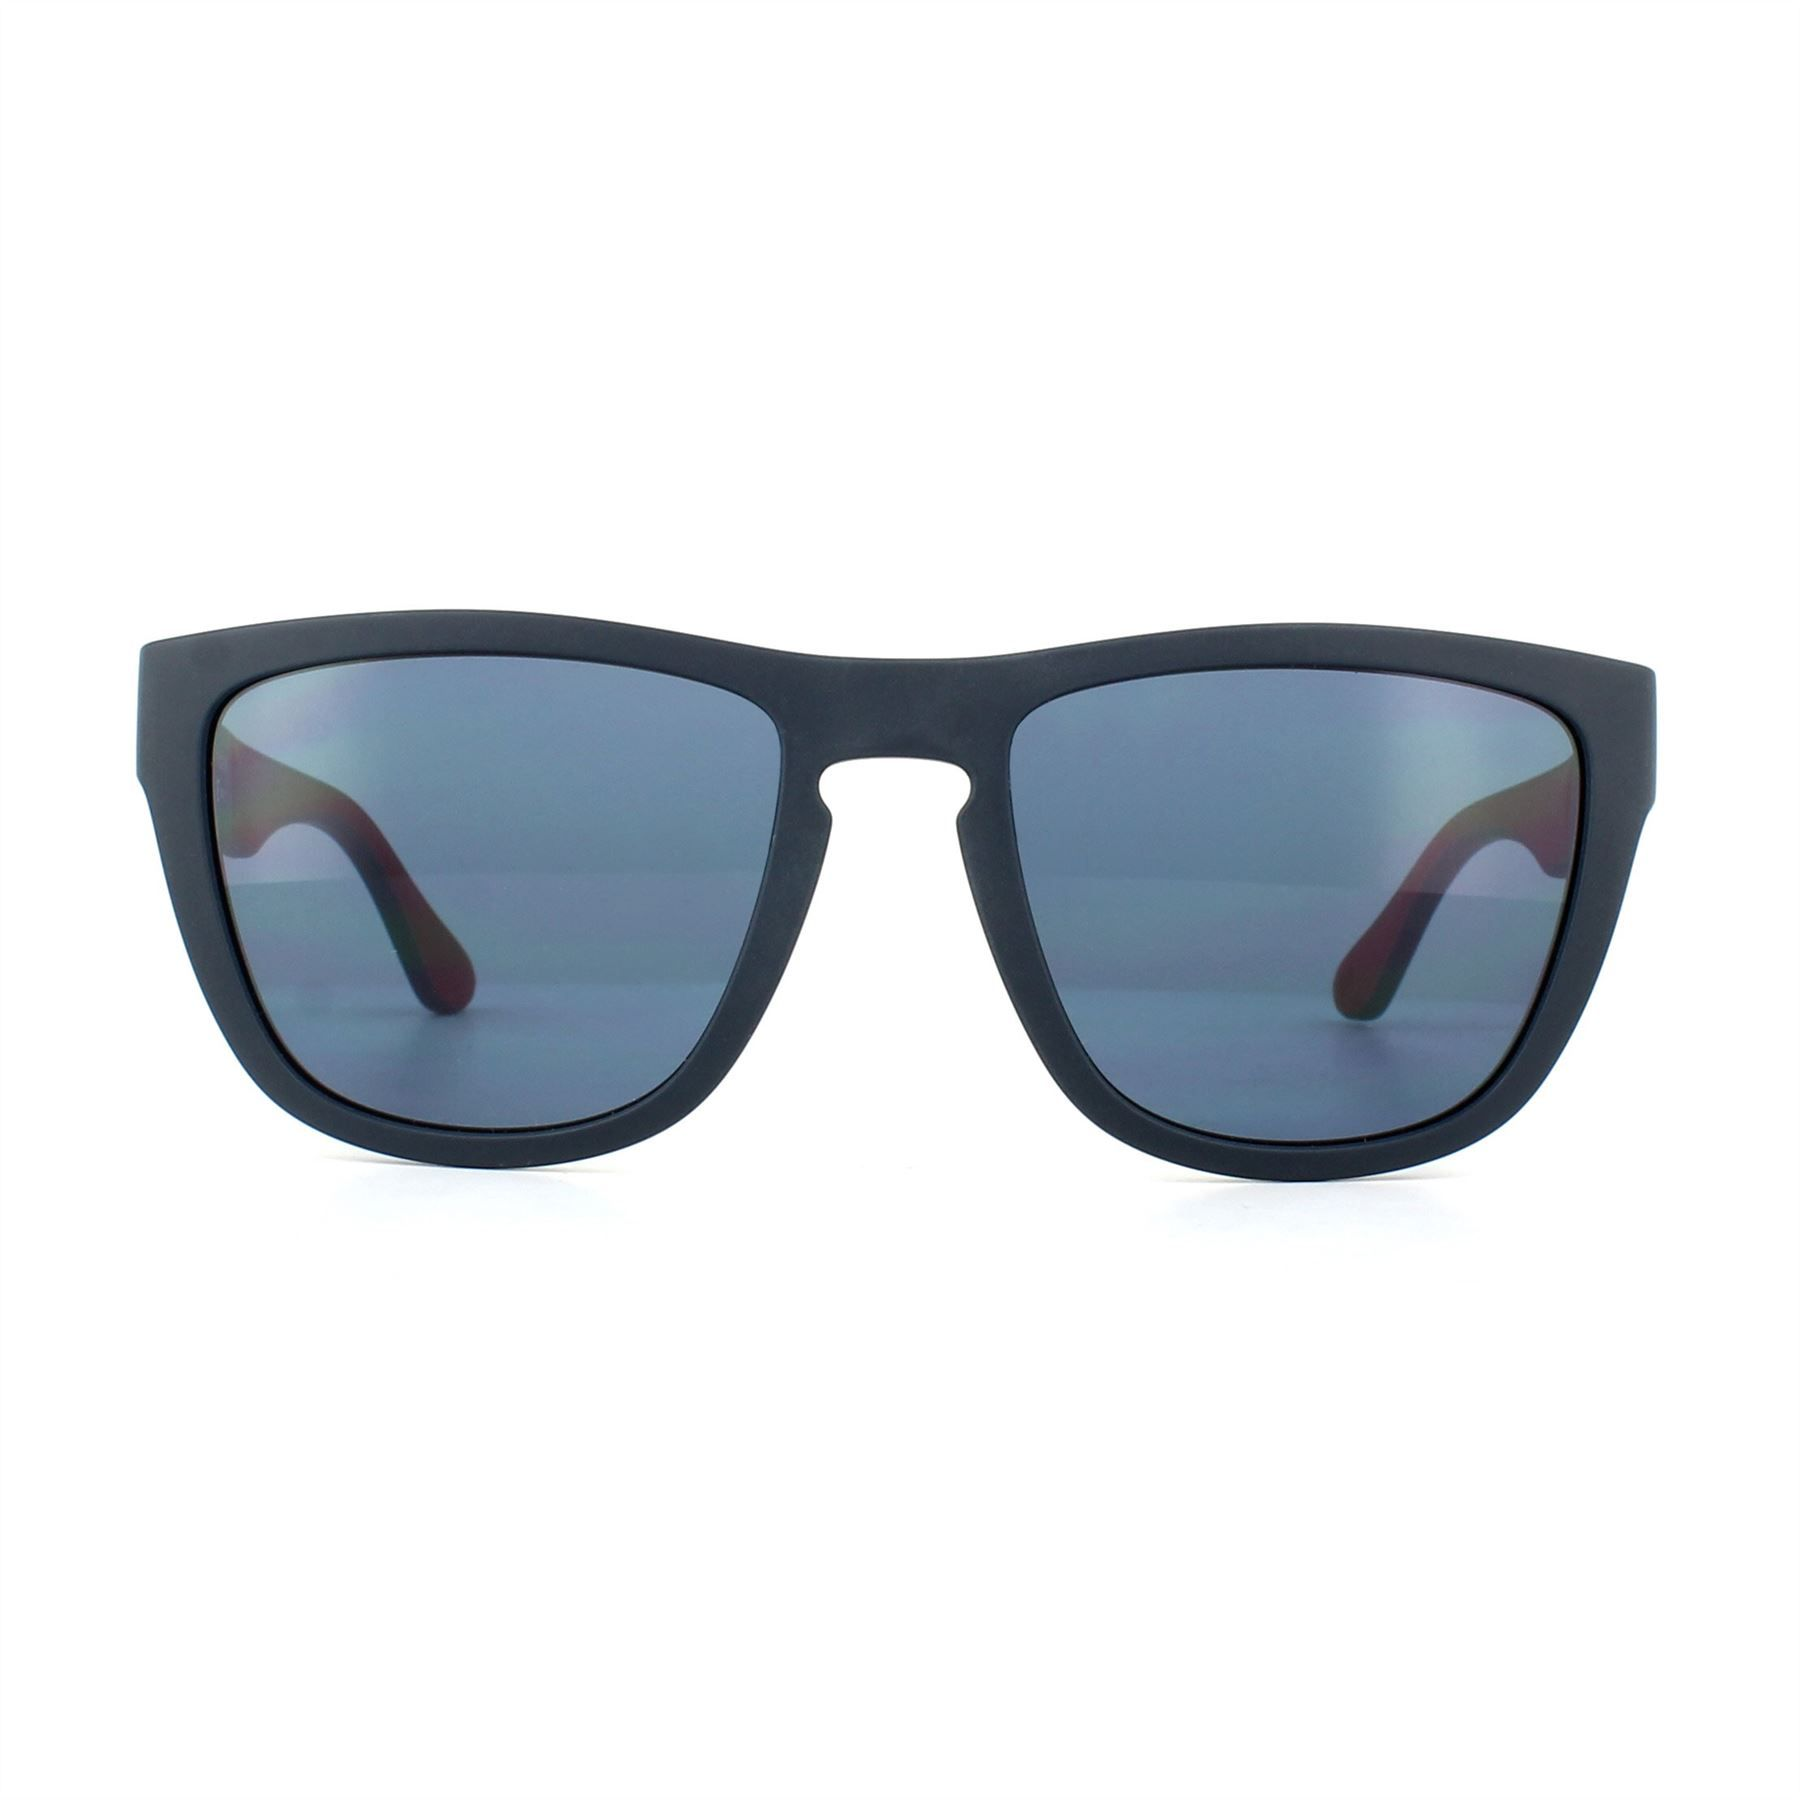 Tommy Hilfiger Sunglasses Th 1557/S 8Ru Ku Blue Blue